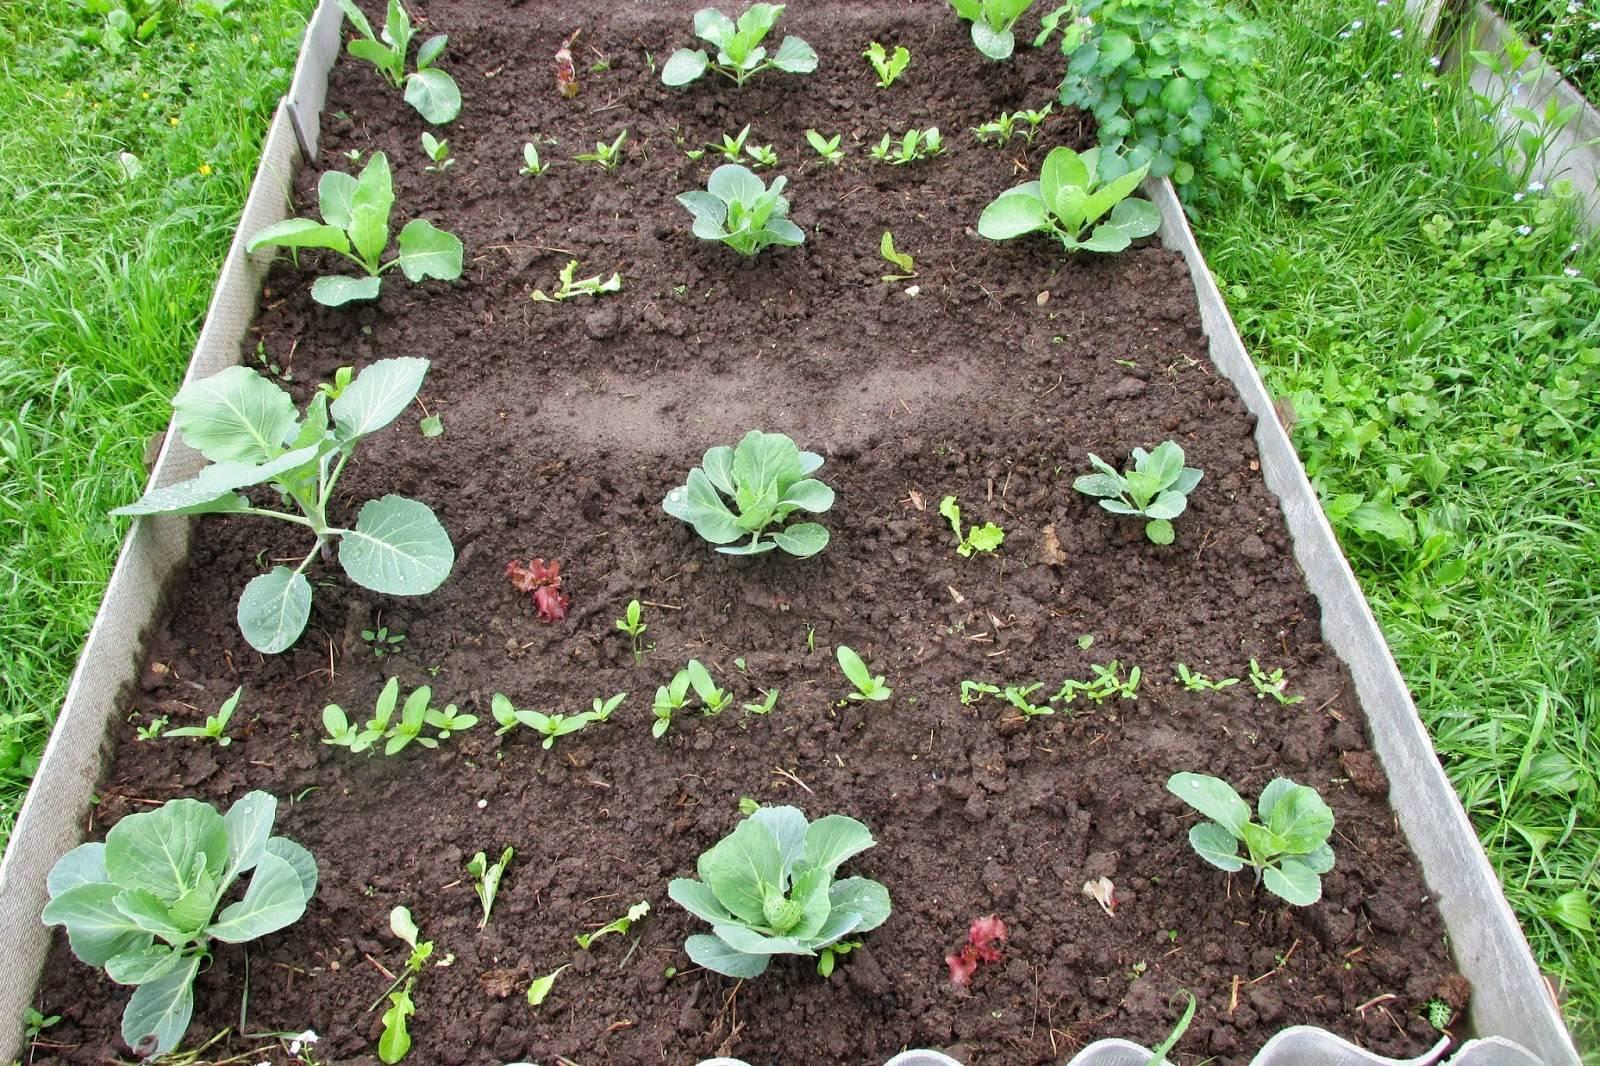 Сроки и правила посадки циннии на рассаду, уход в домашних условиях